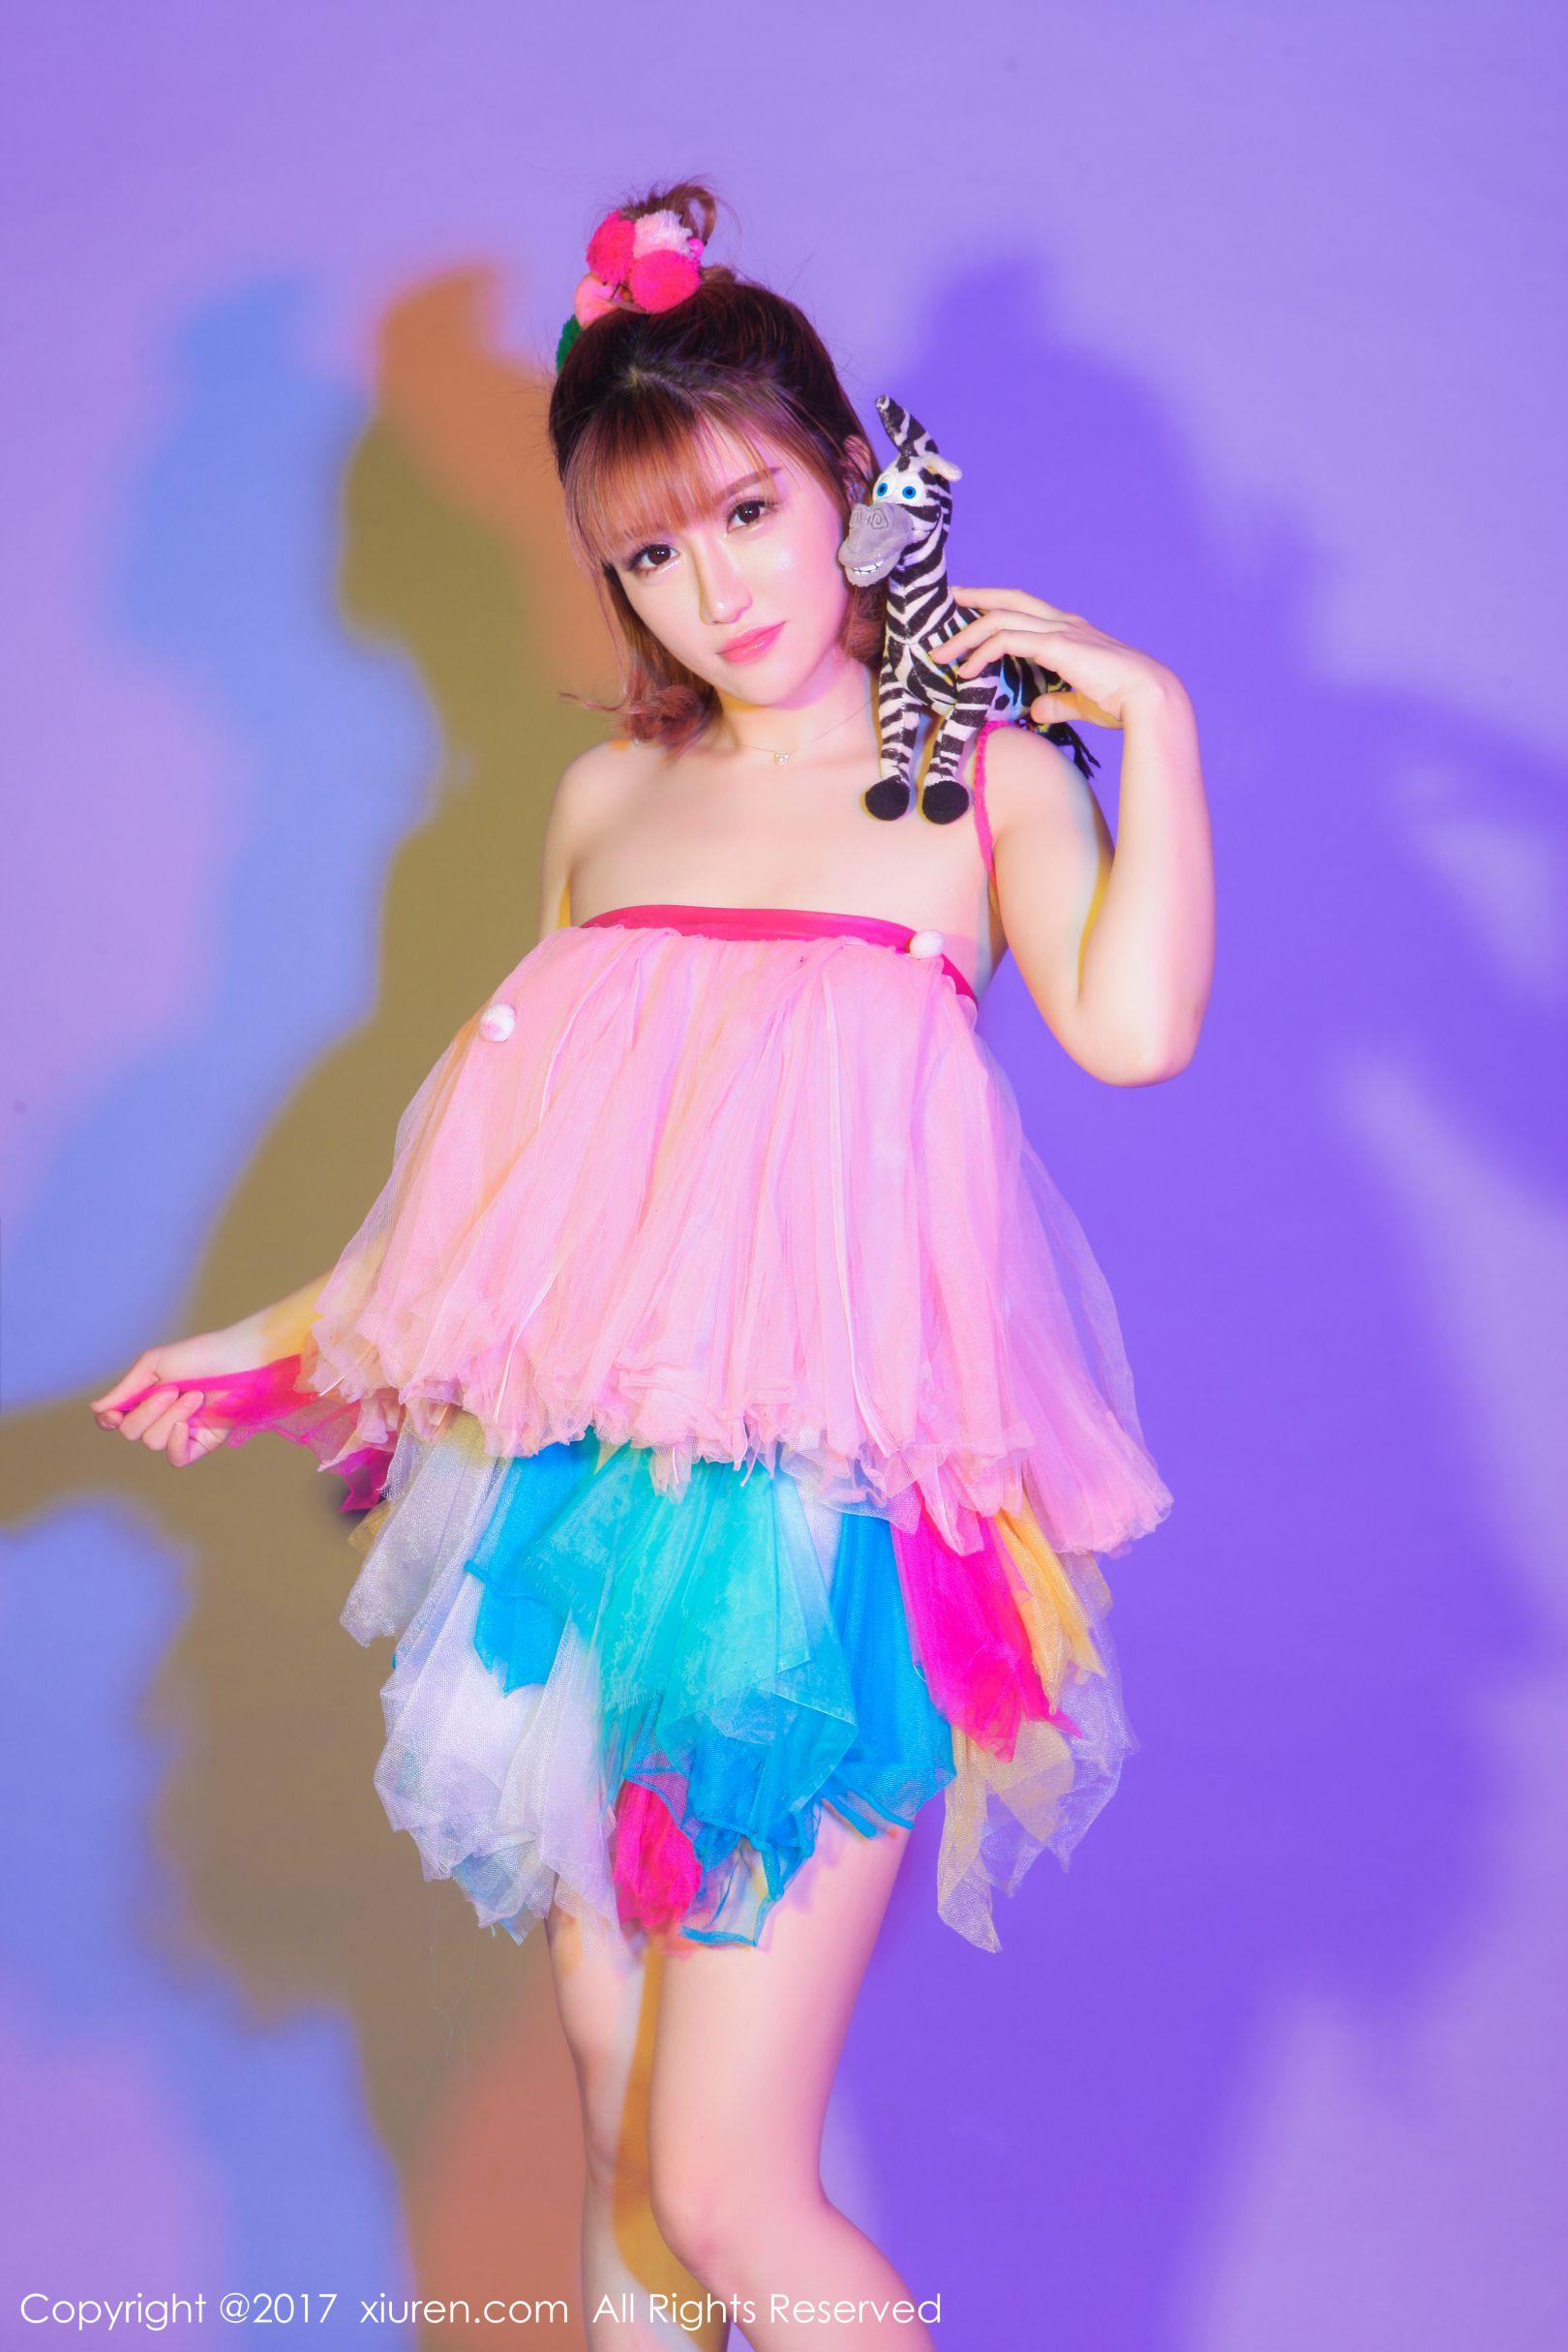 [XiuRen秀人网] No.722 K8傲娇萌萌Vivian - COS超级索尼子与梦幻七彩裙子 丝袜美图图片[62P]